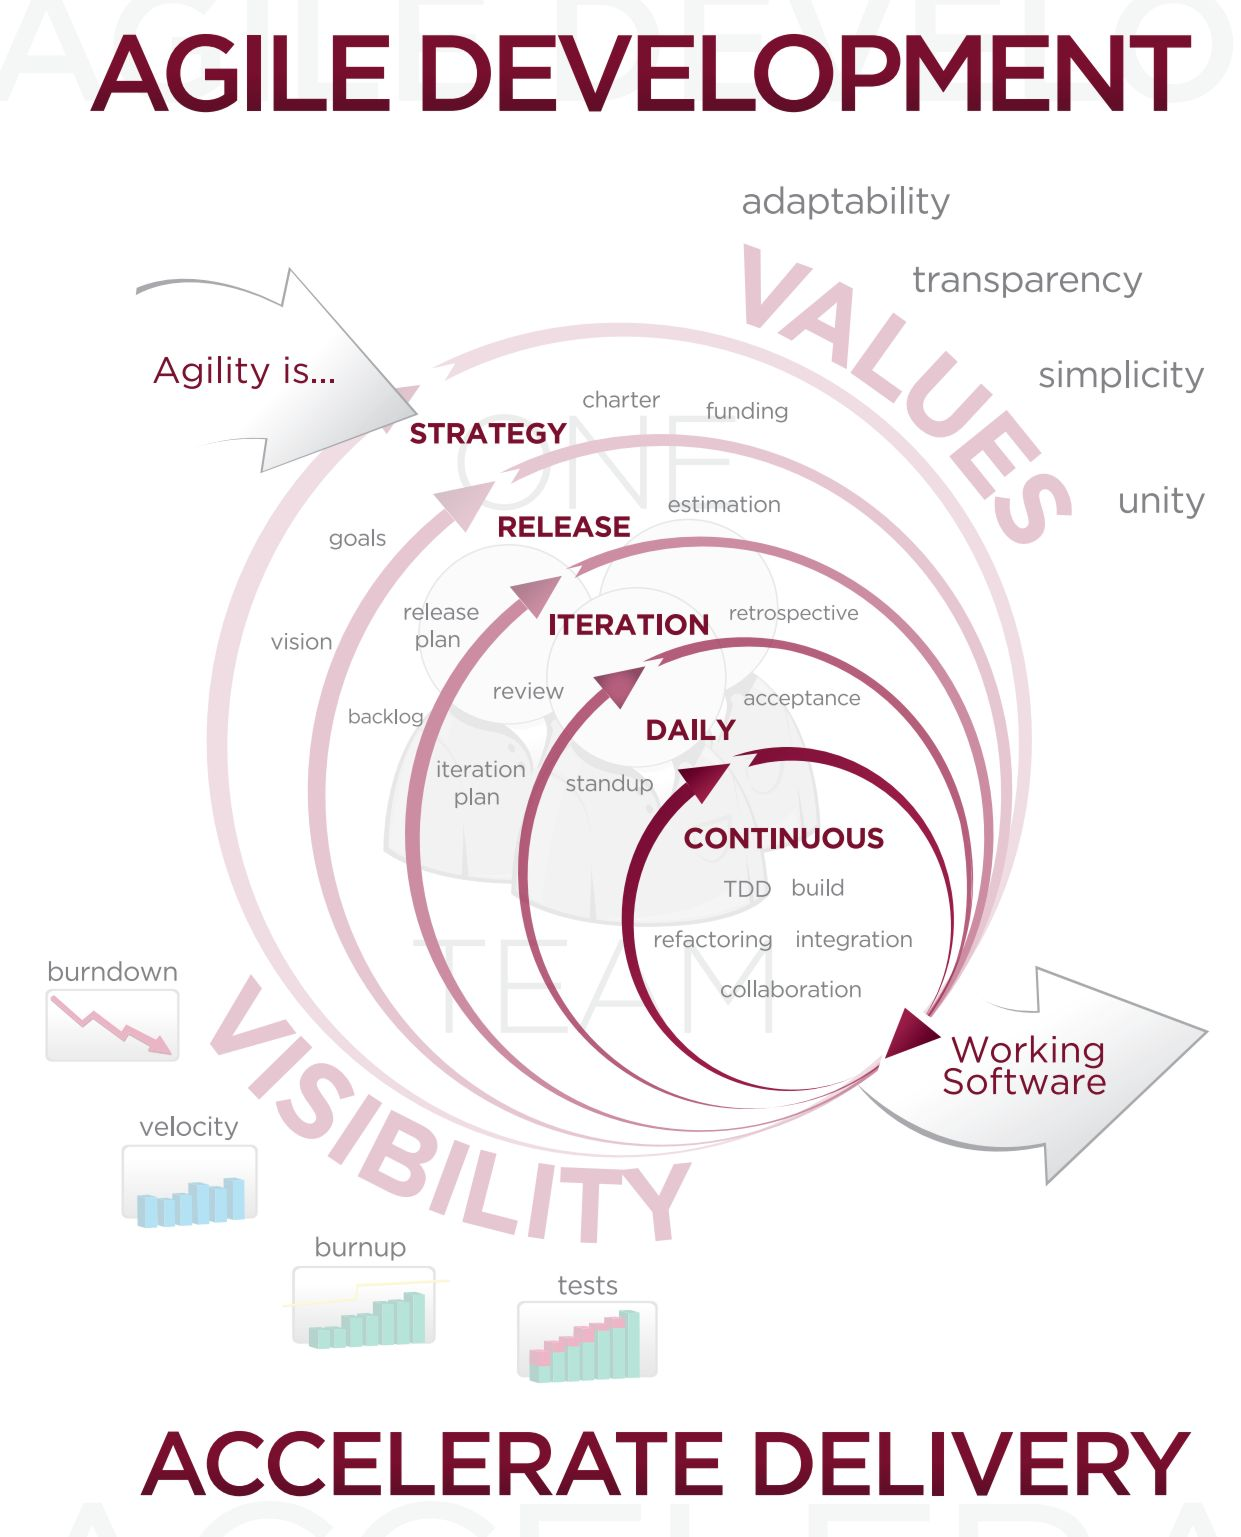 post agile checklist - What Is Agile Methodology Pdf